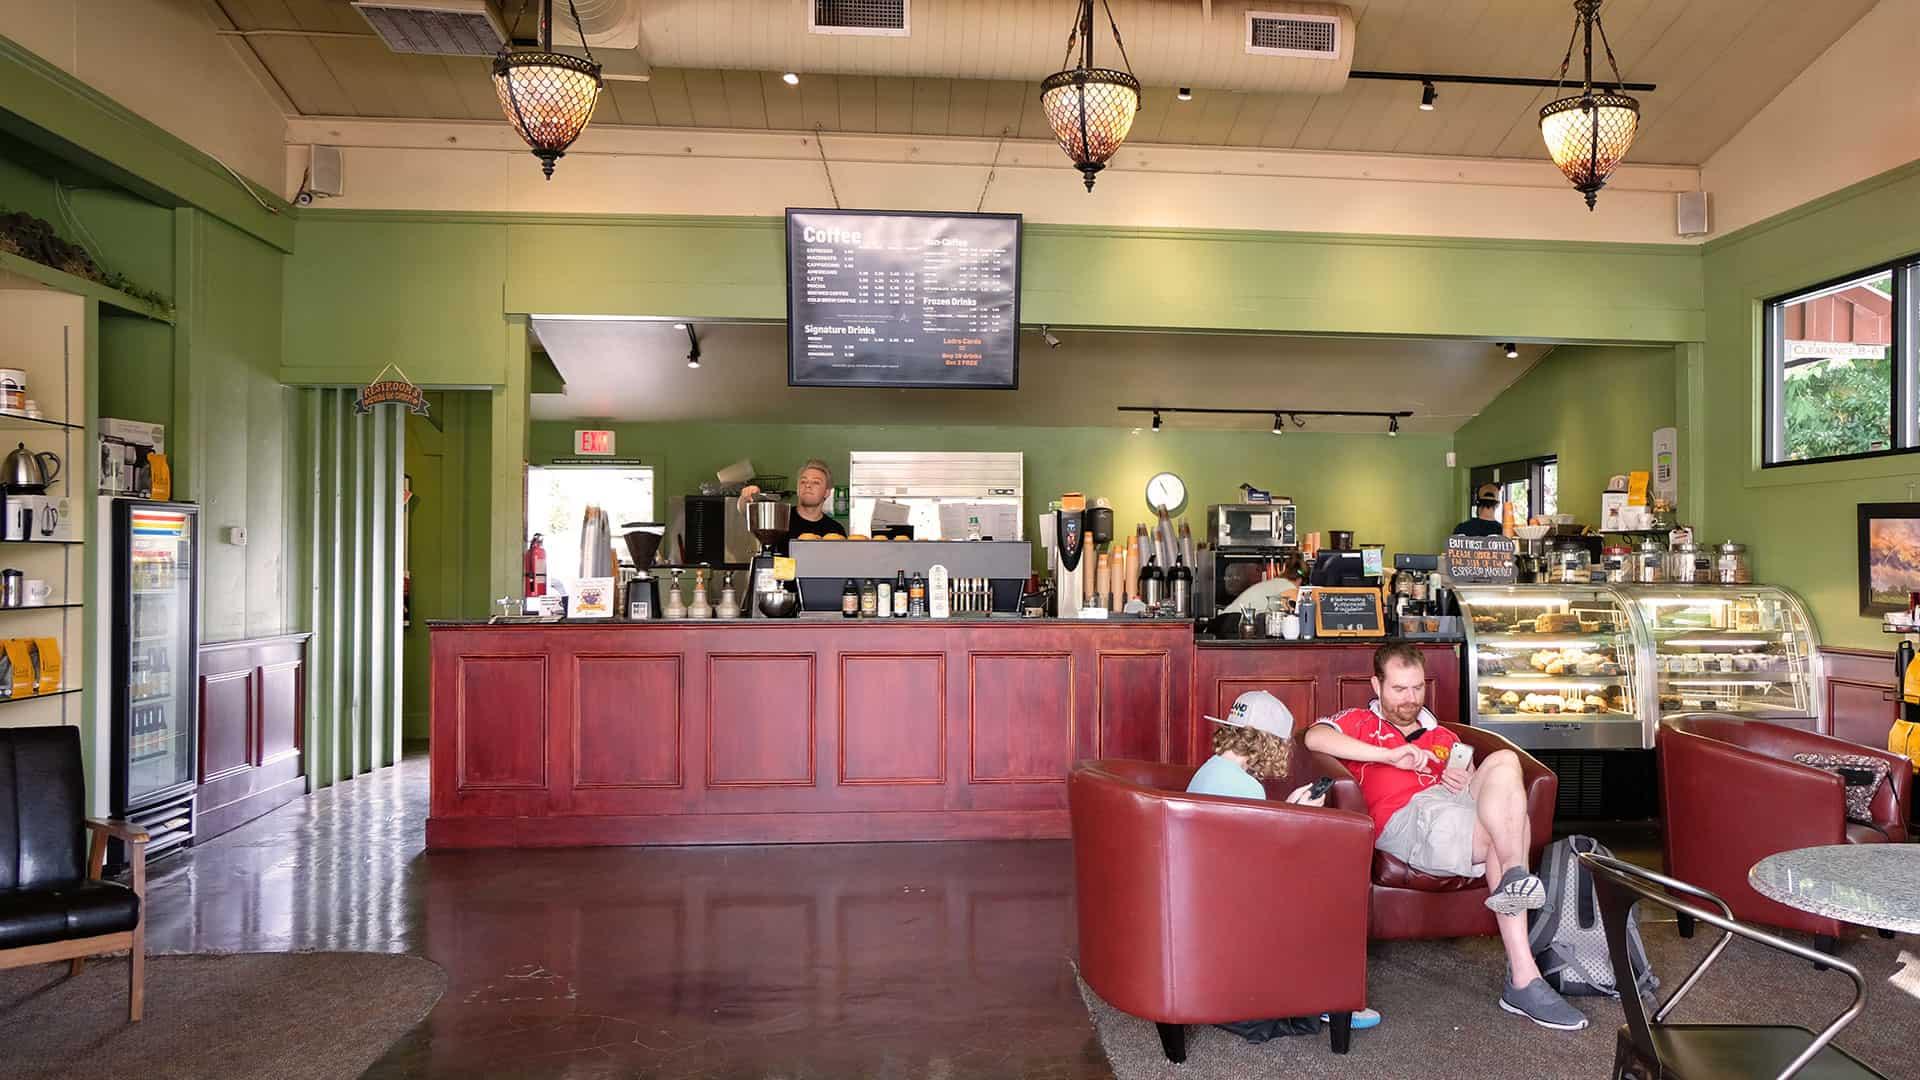 Bothell Caffe Ladro interior